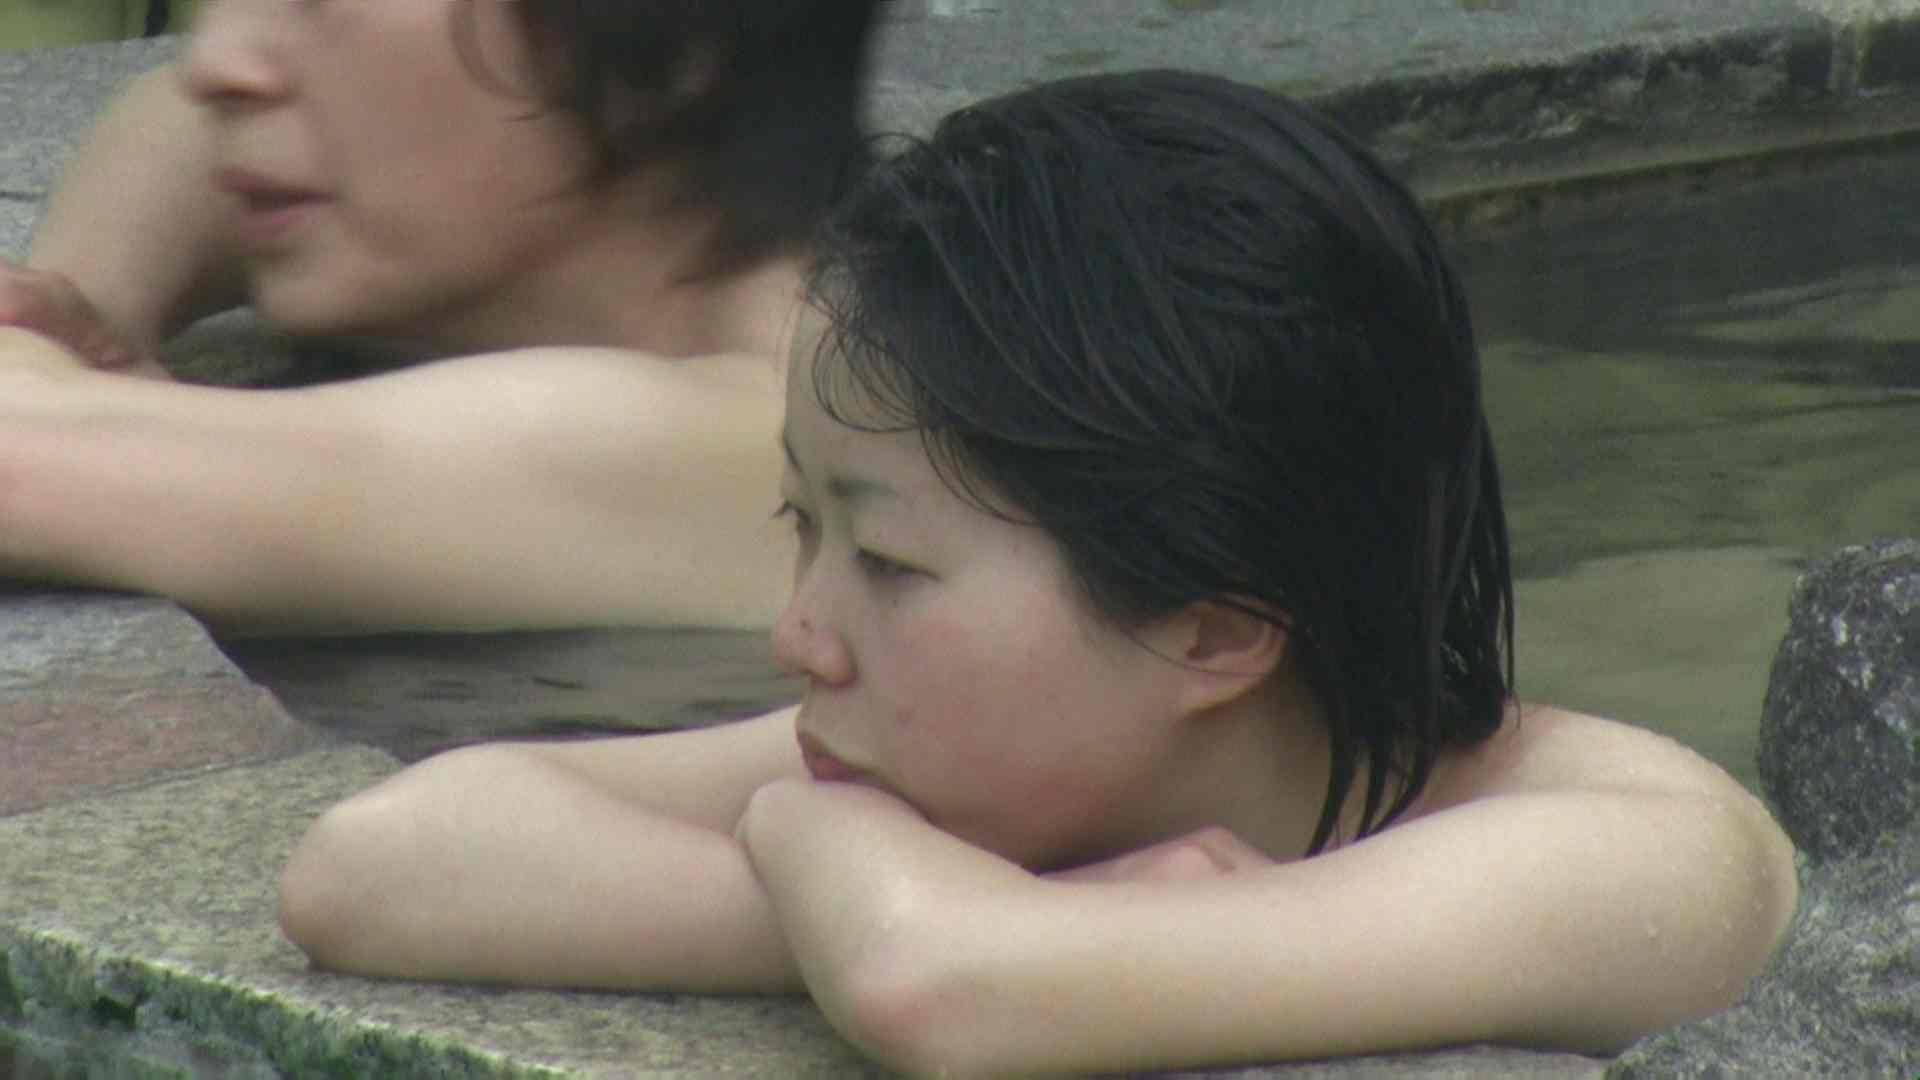 Aquaな露天風呂Vol.06【VIP】 盗撮 | OLエロ画像  113PICs 31